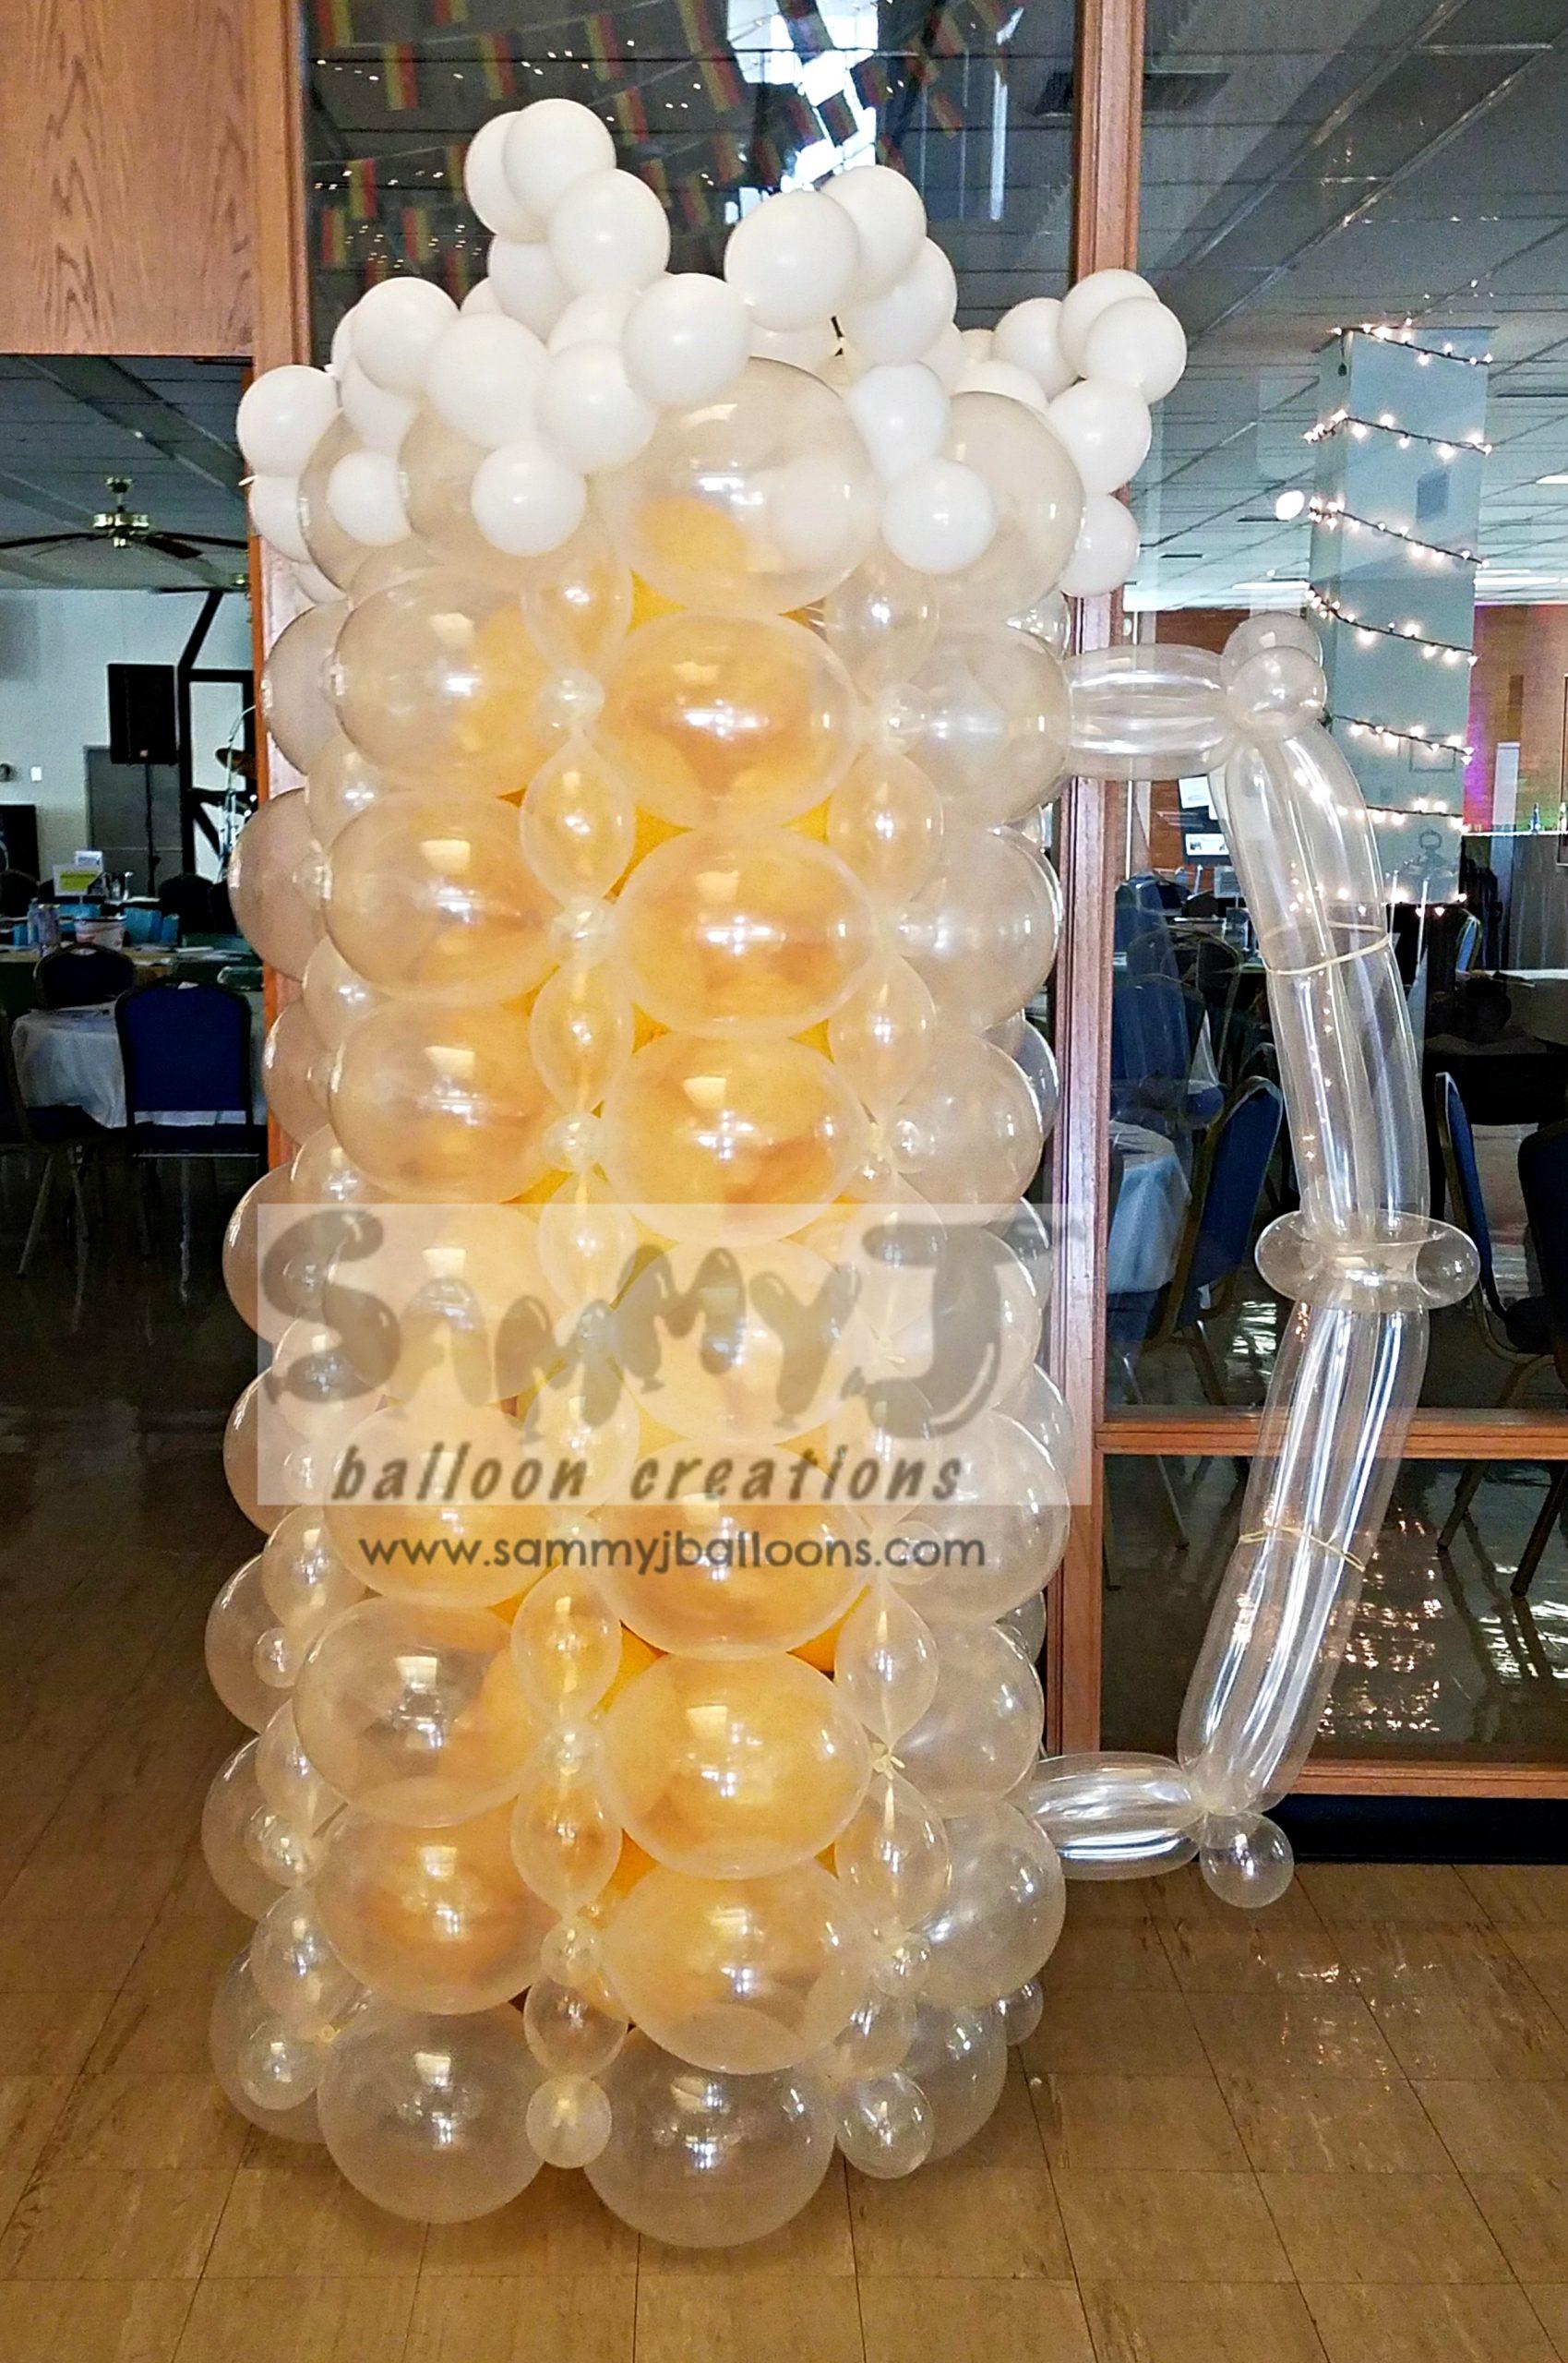 SAMMY J Balloon Creations st louis balloons beer mug